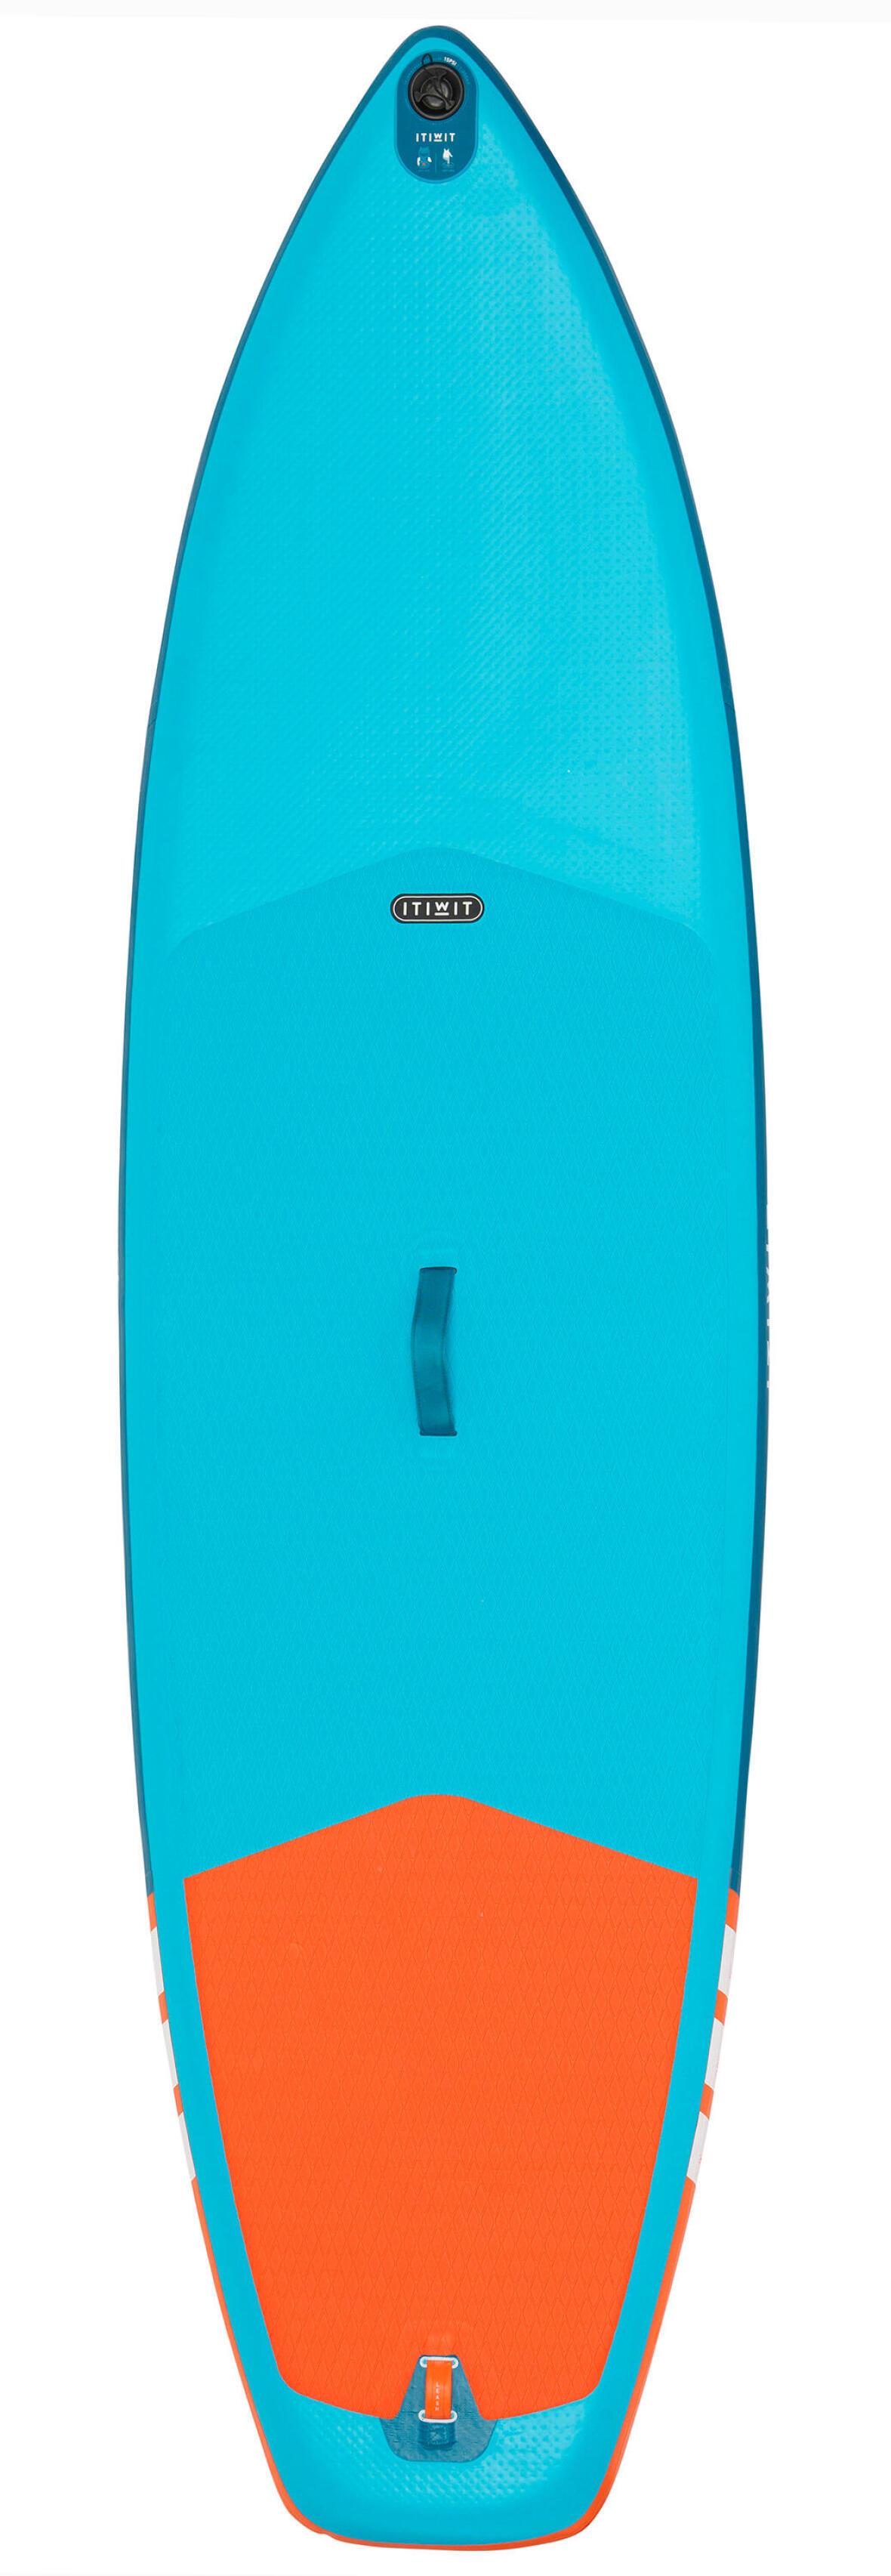 itiwit-sup-gonflable-x100-9-bleu-decathlon